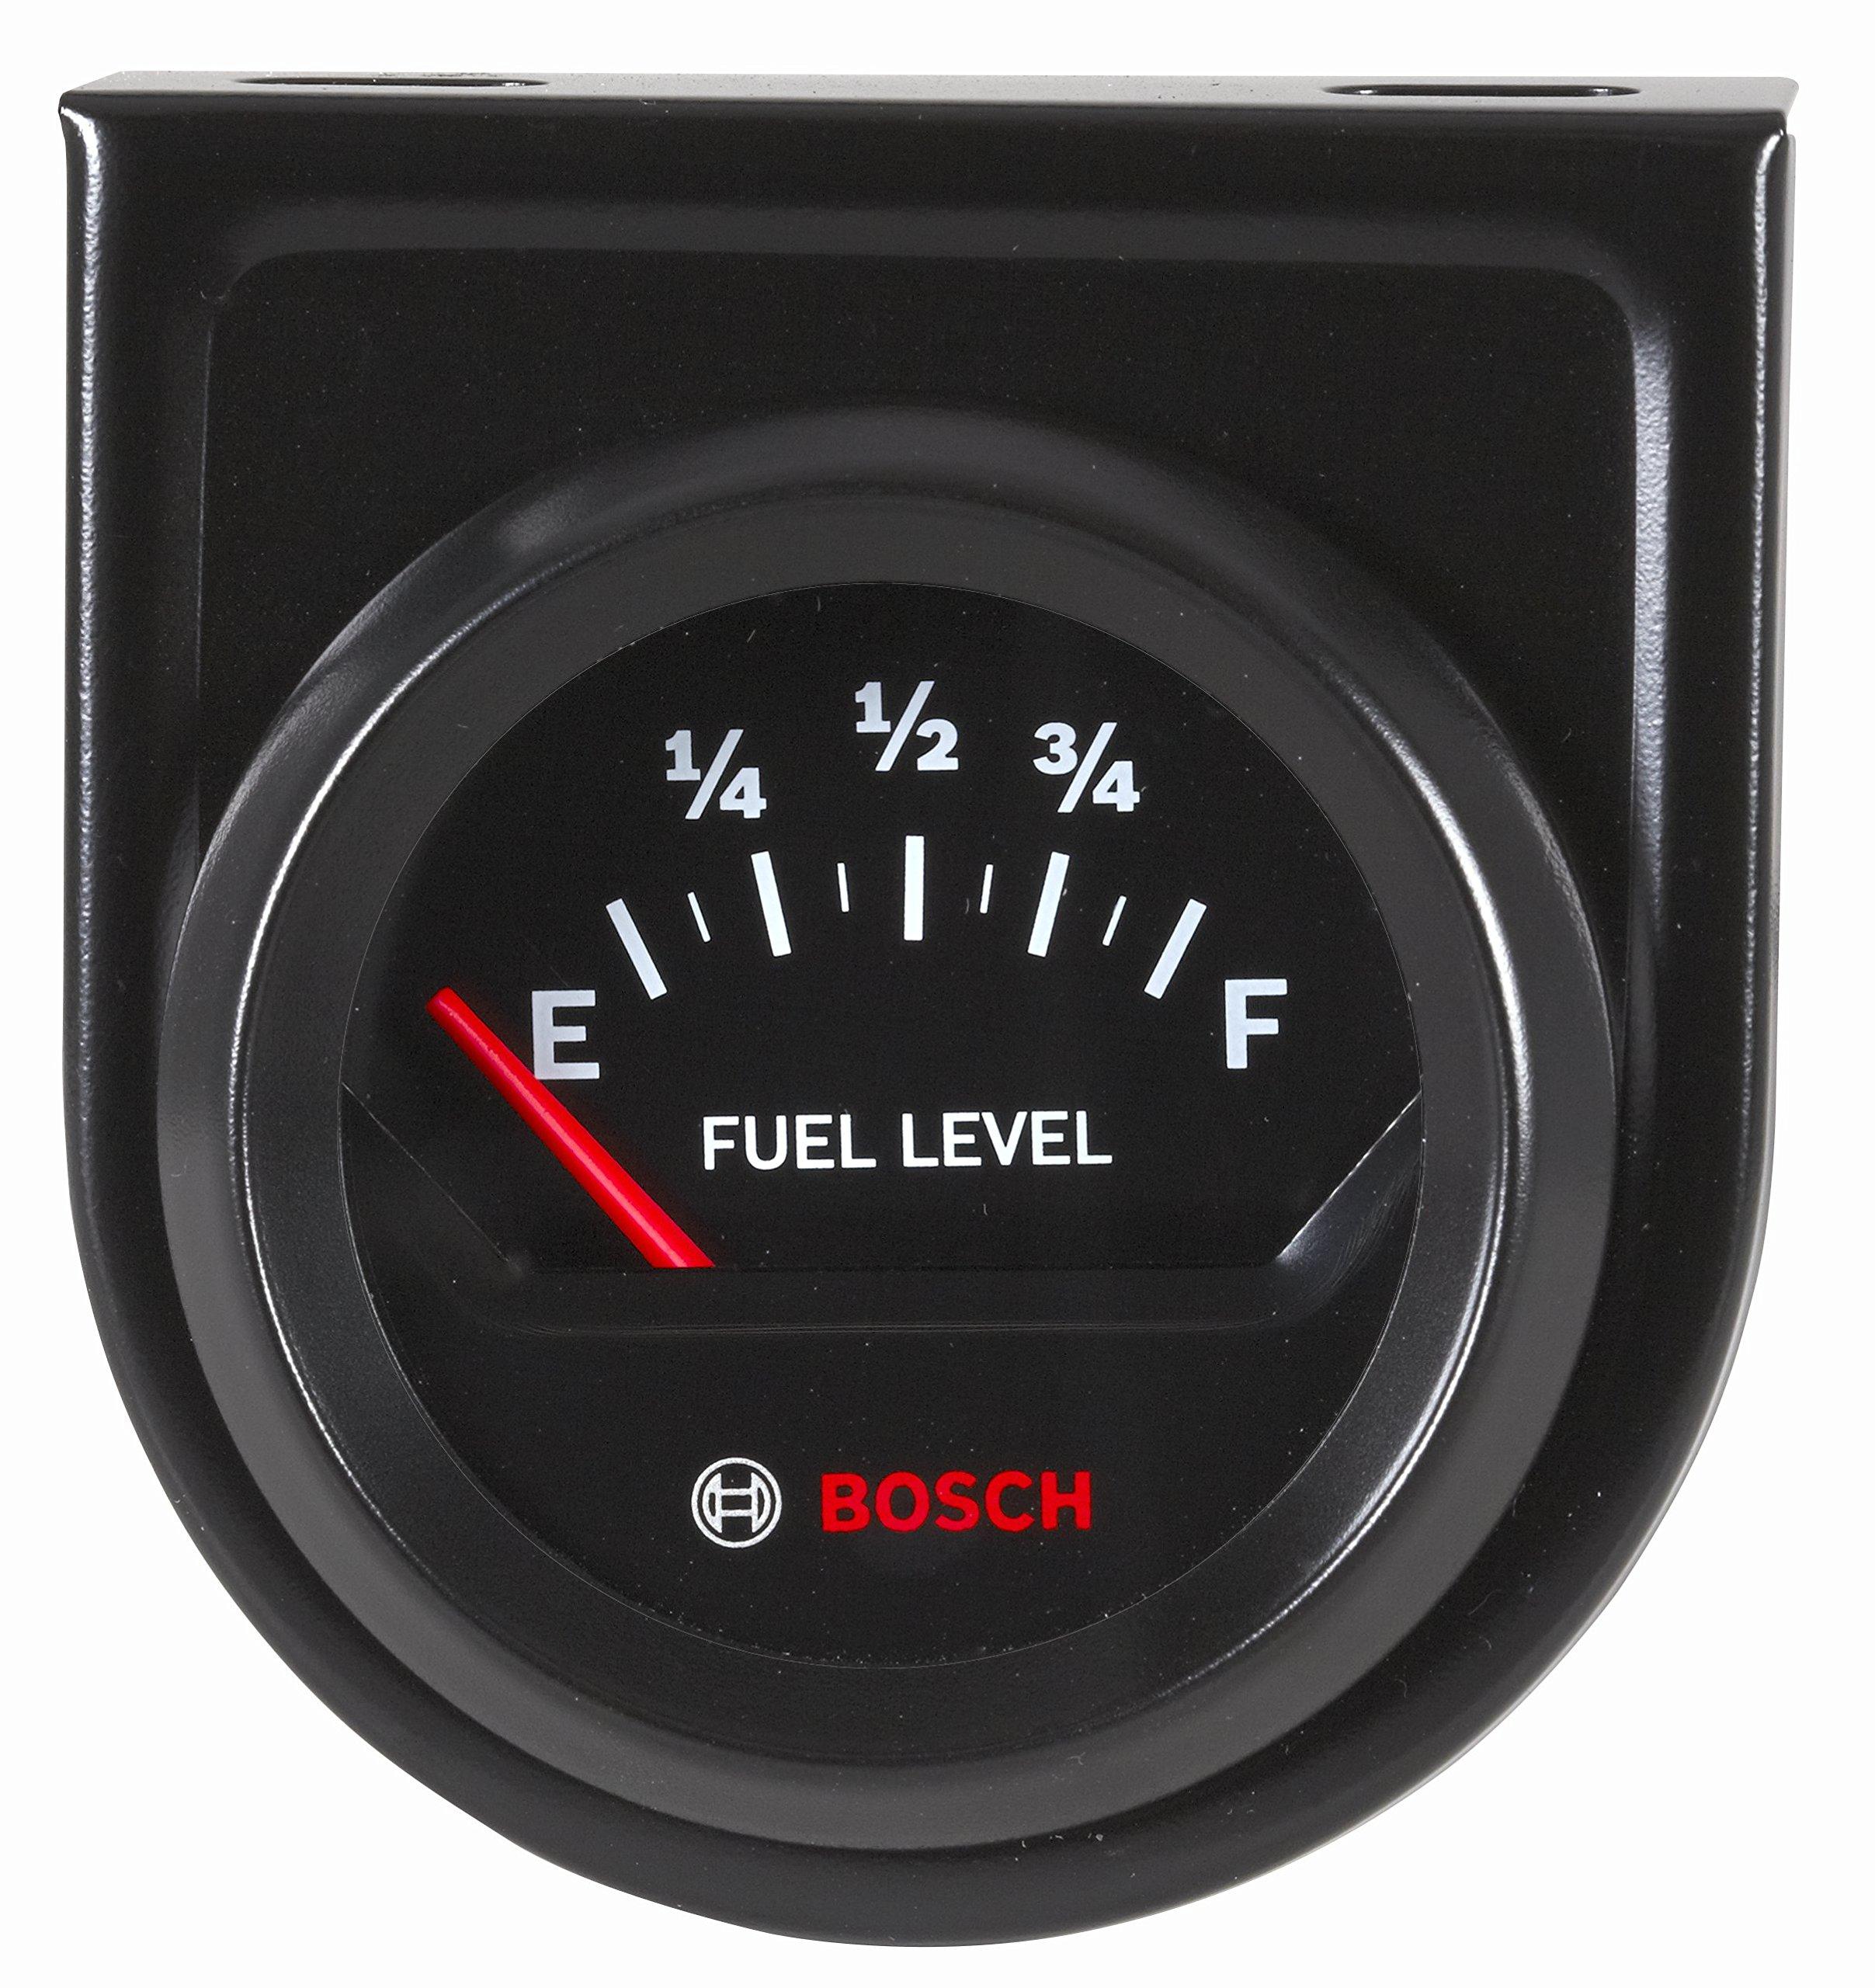 Bosch SP0F000056 Style Line 2'' Electrical Fuel Level Gauge (Black Dial Face, Black Bezel) by Bosch Automotive